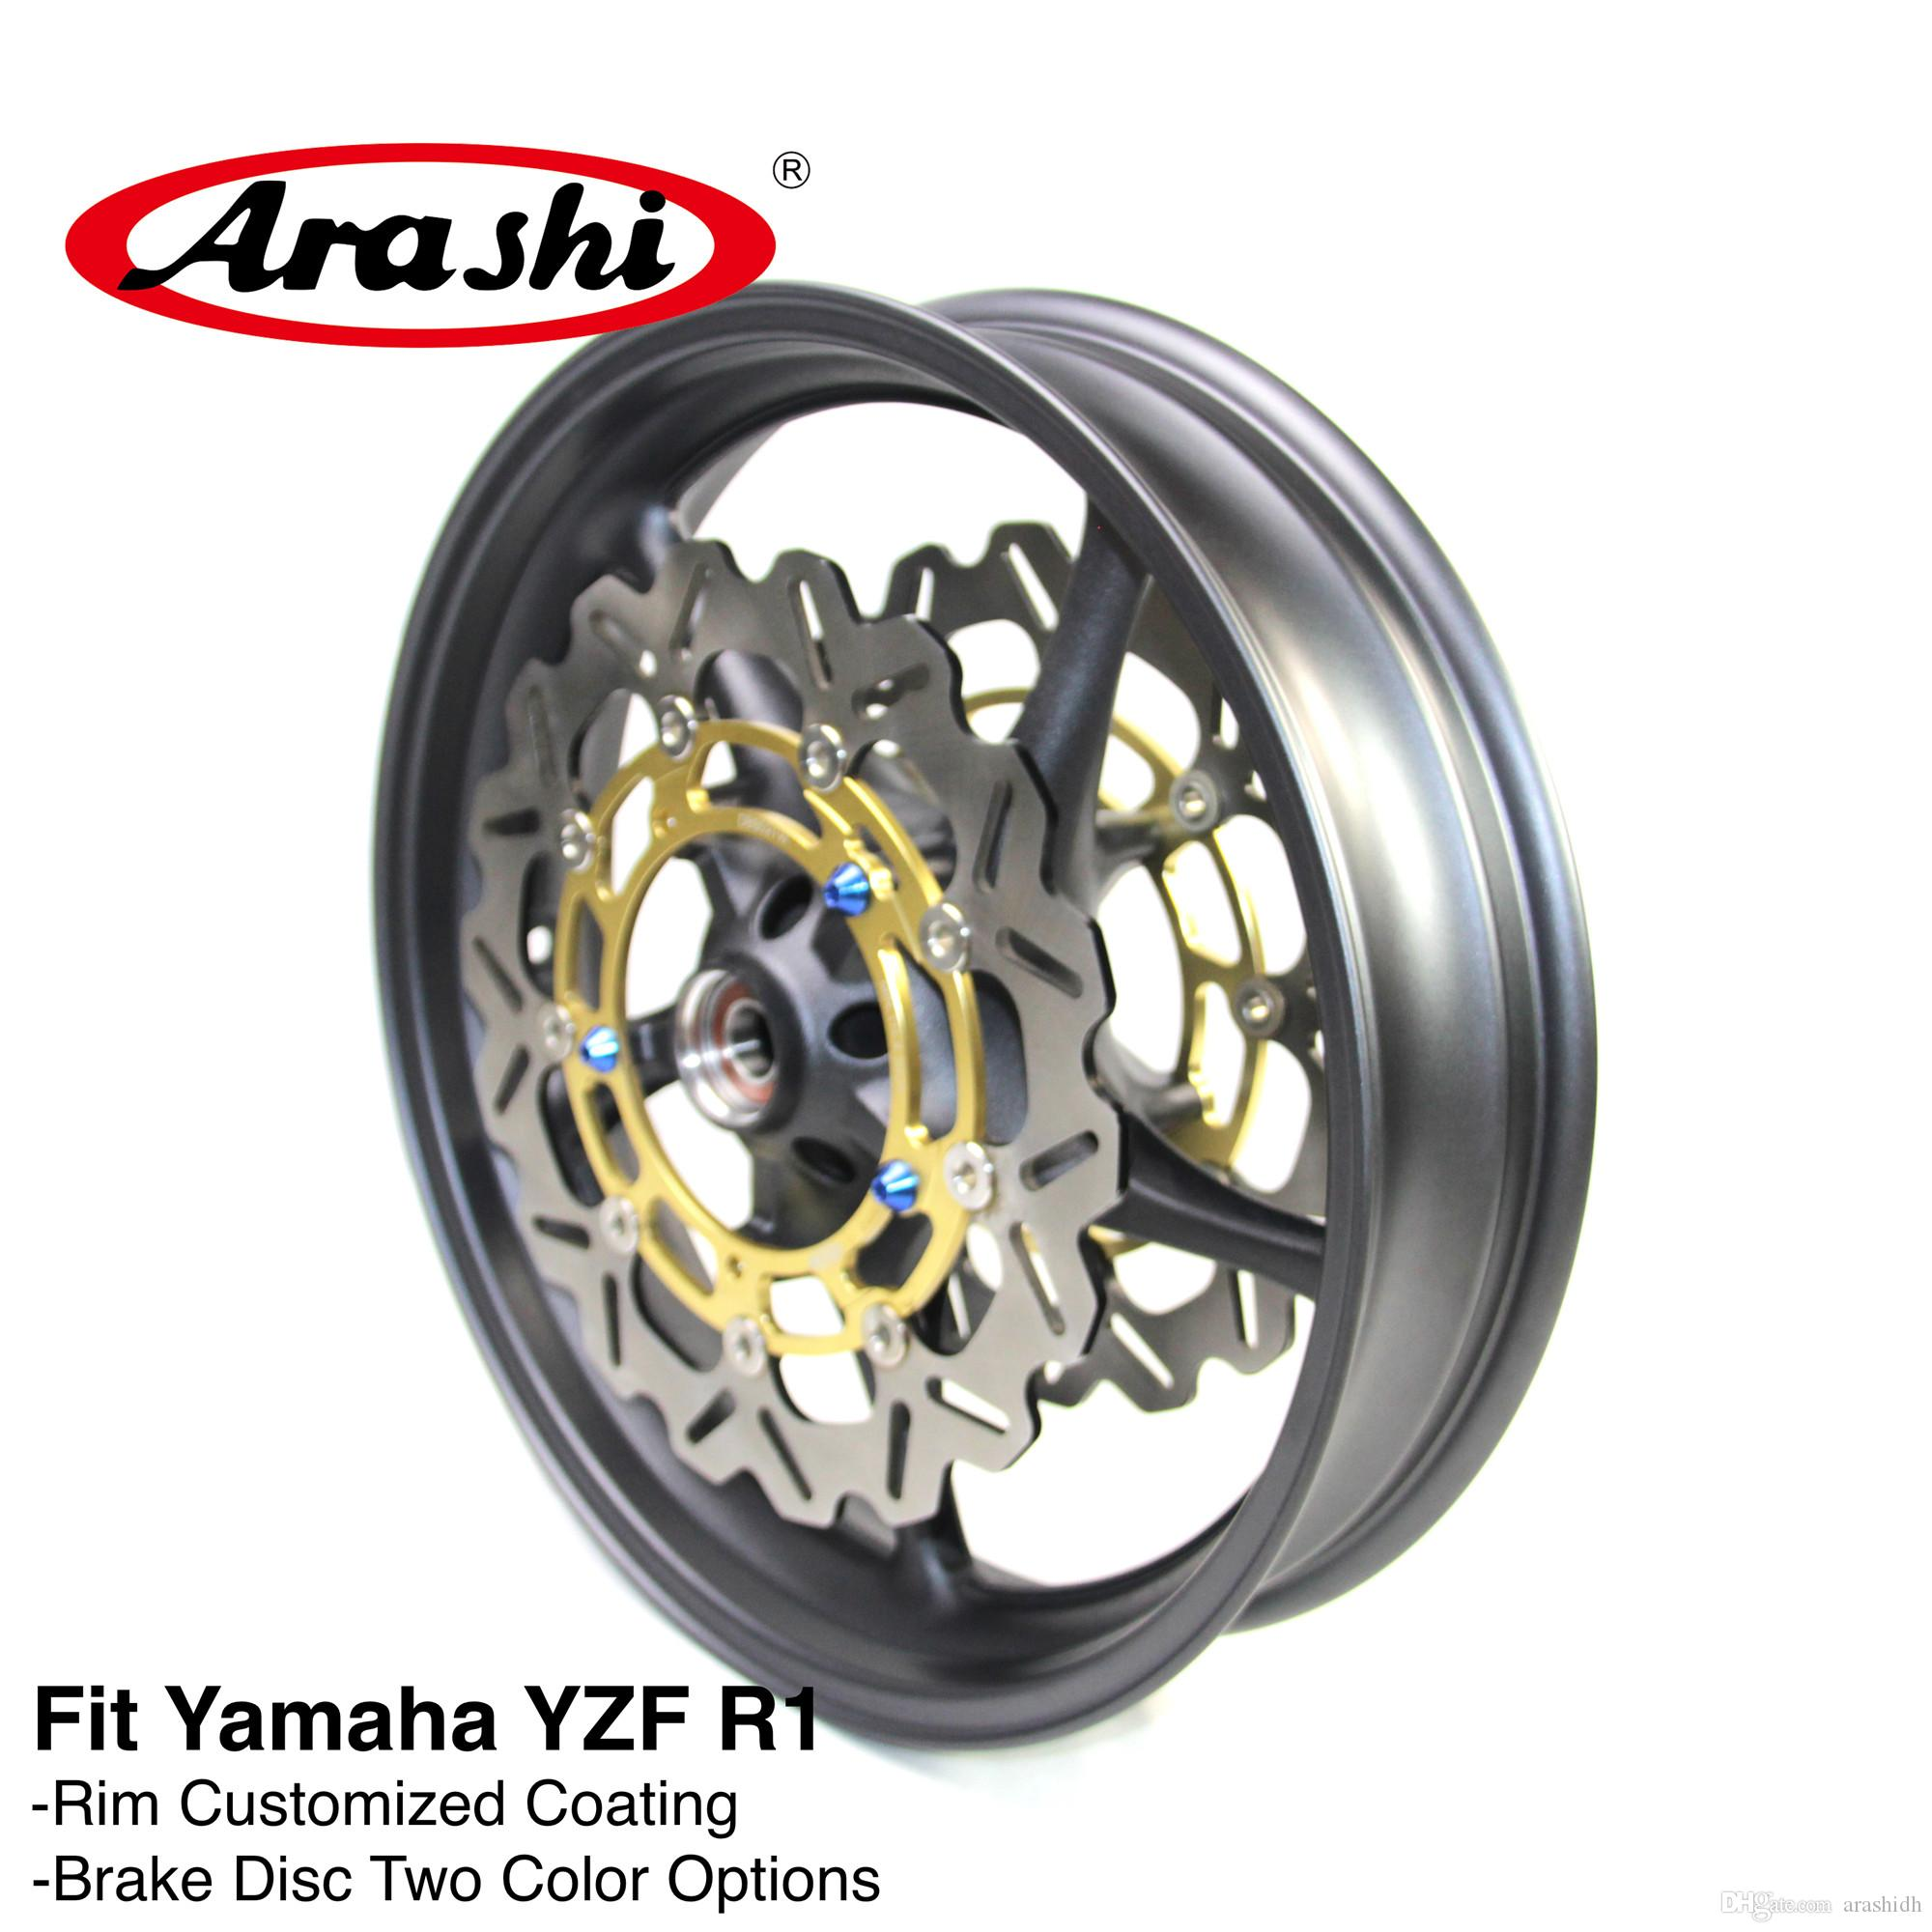 Arashi For Yamaha Yzf R1 2006 2012 Front Wheel Rim Brake Disc Disk Rotor Motorcycle Parts 2007 2008 2009 2010 2011 Yzf R1 Yzf R6